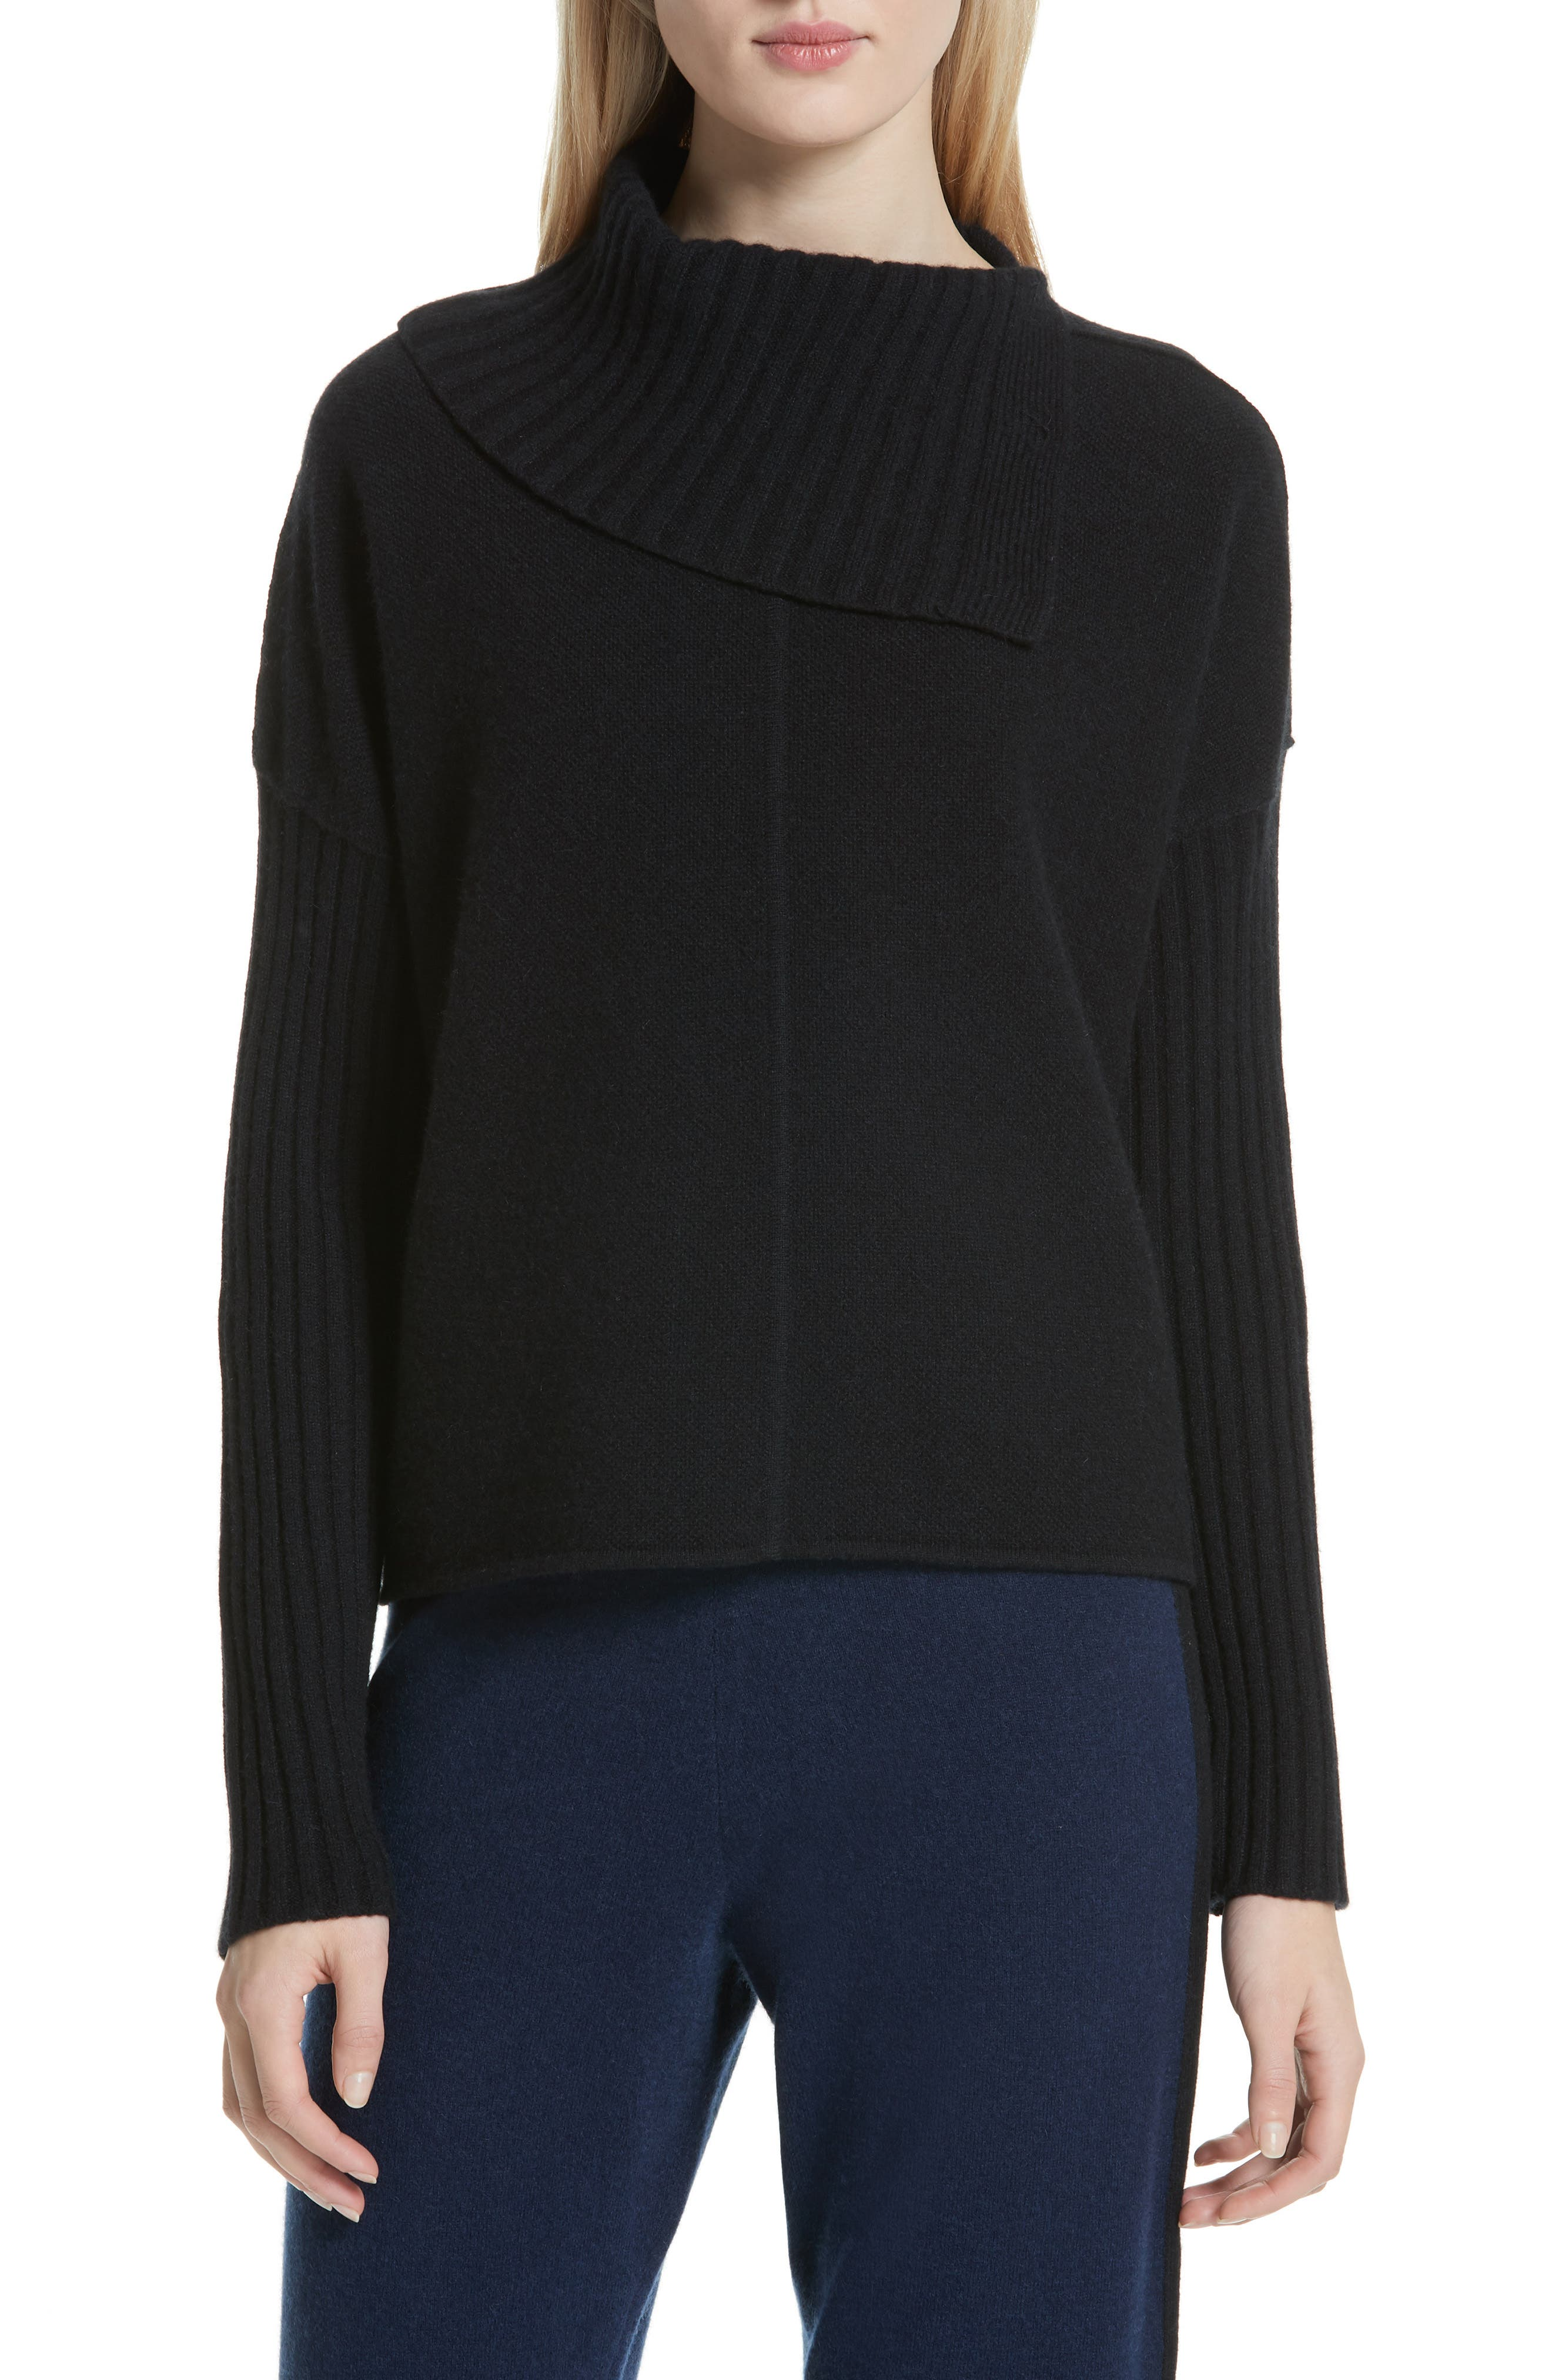 Nordstrom Signature Split Turtleneck Cashmere Sweater, Black